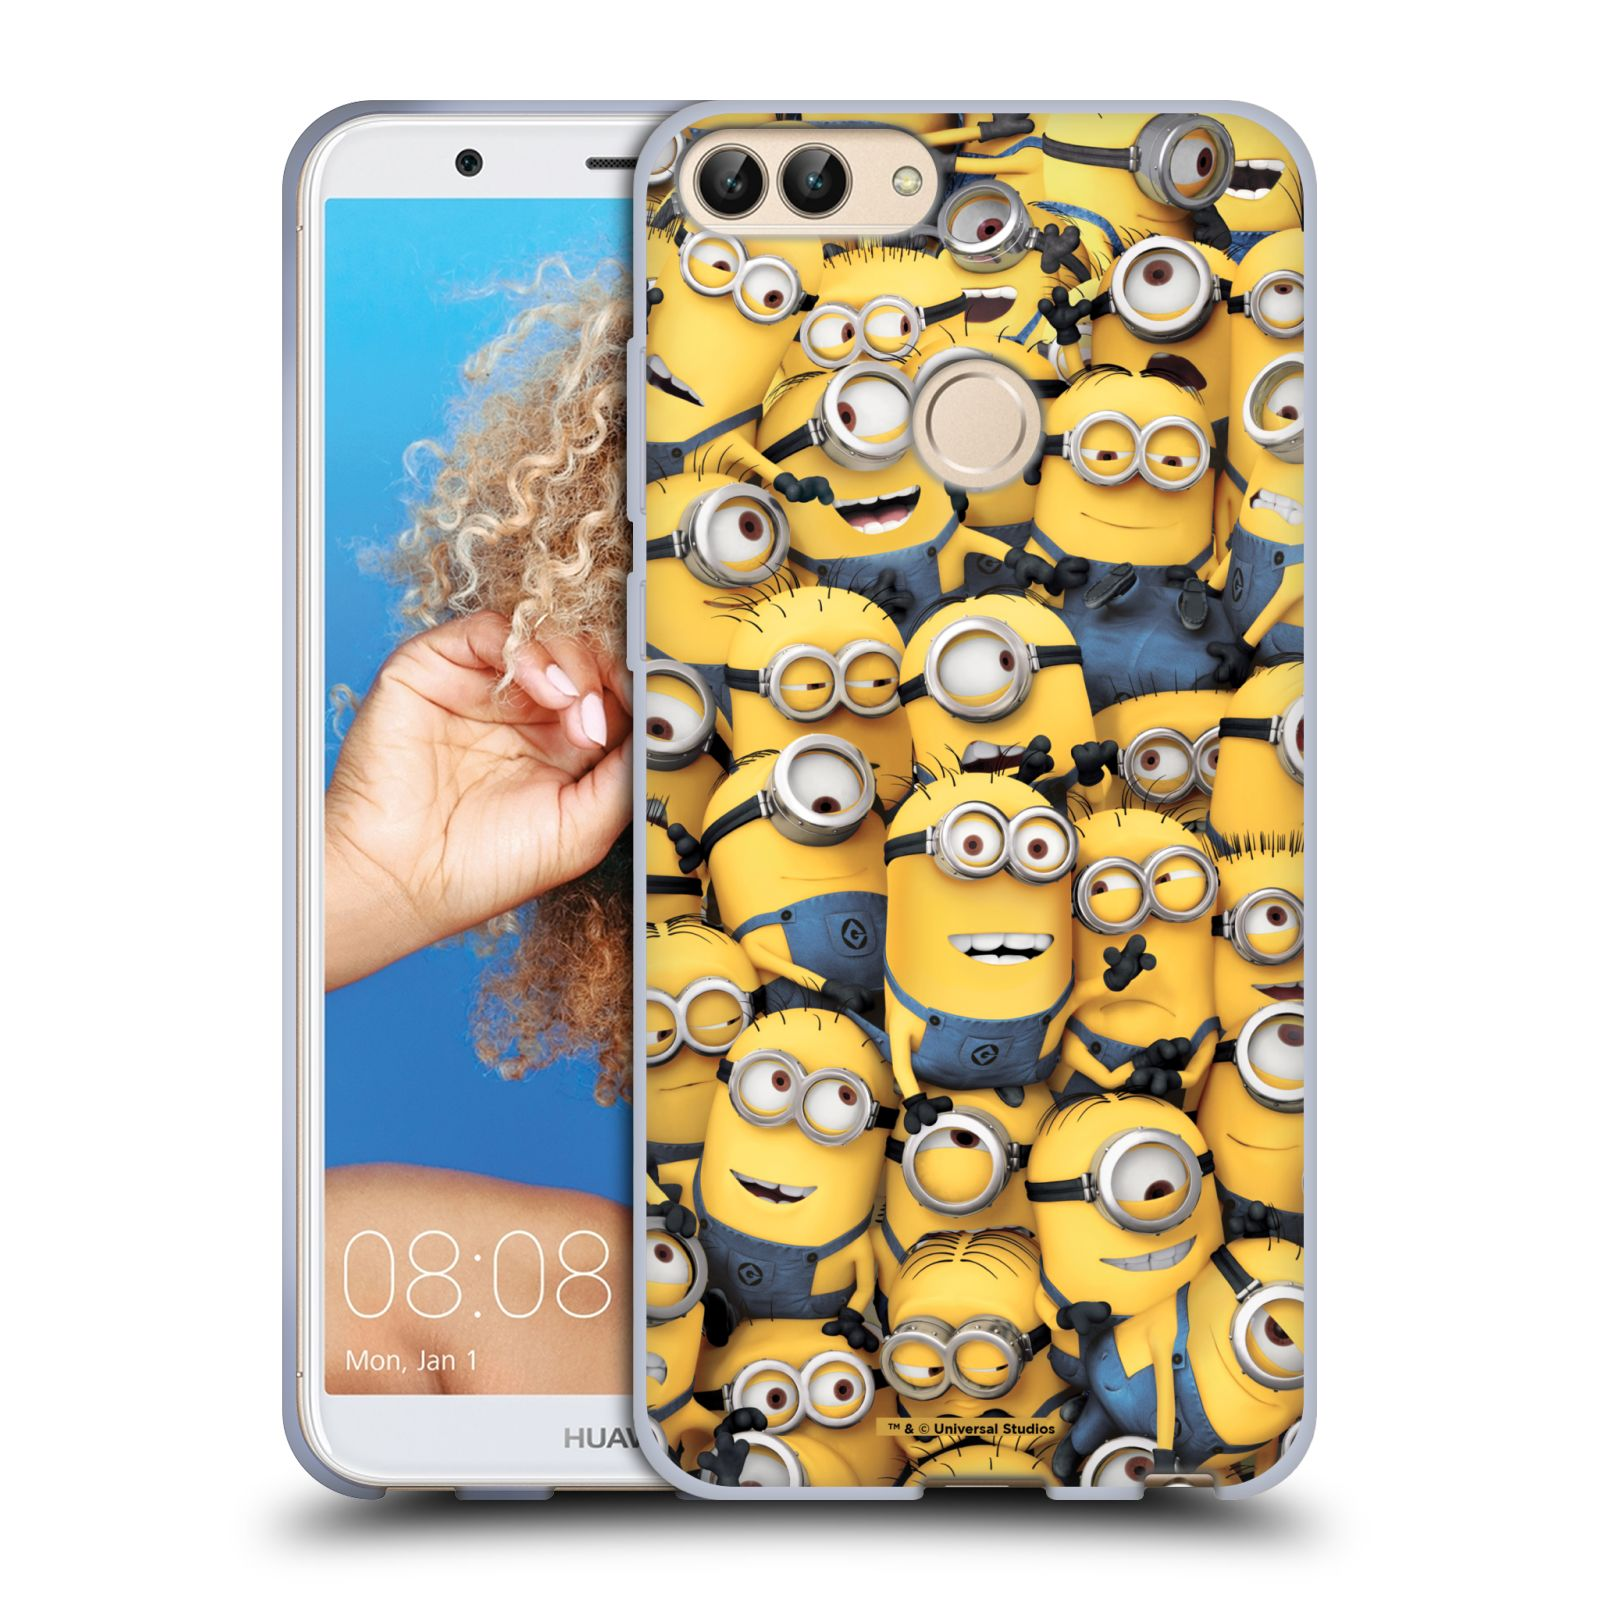 Silikonové pouzdro na mobil Huawei P Smart - Head Case - Mimoni všude z filmu Já, padouch - Despicable Me